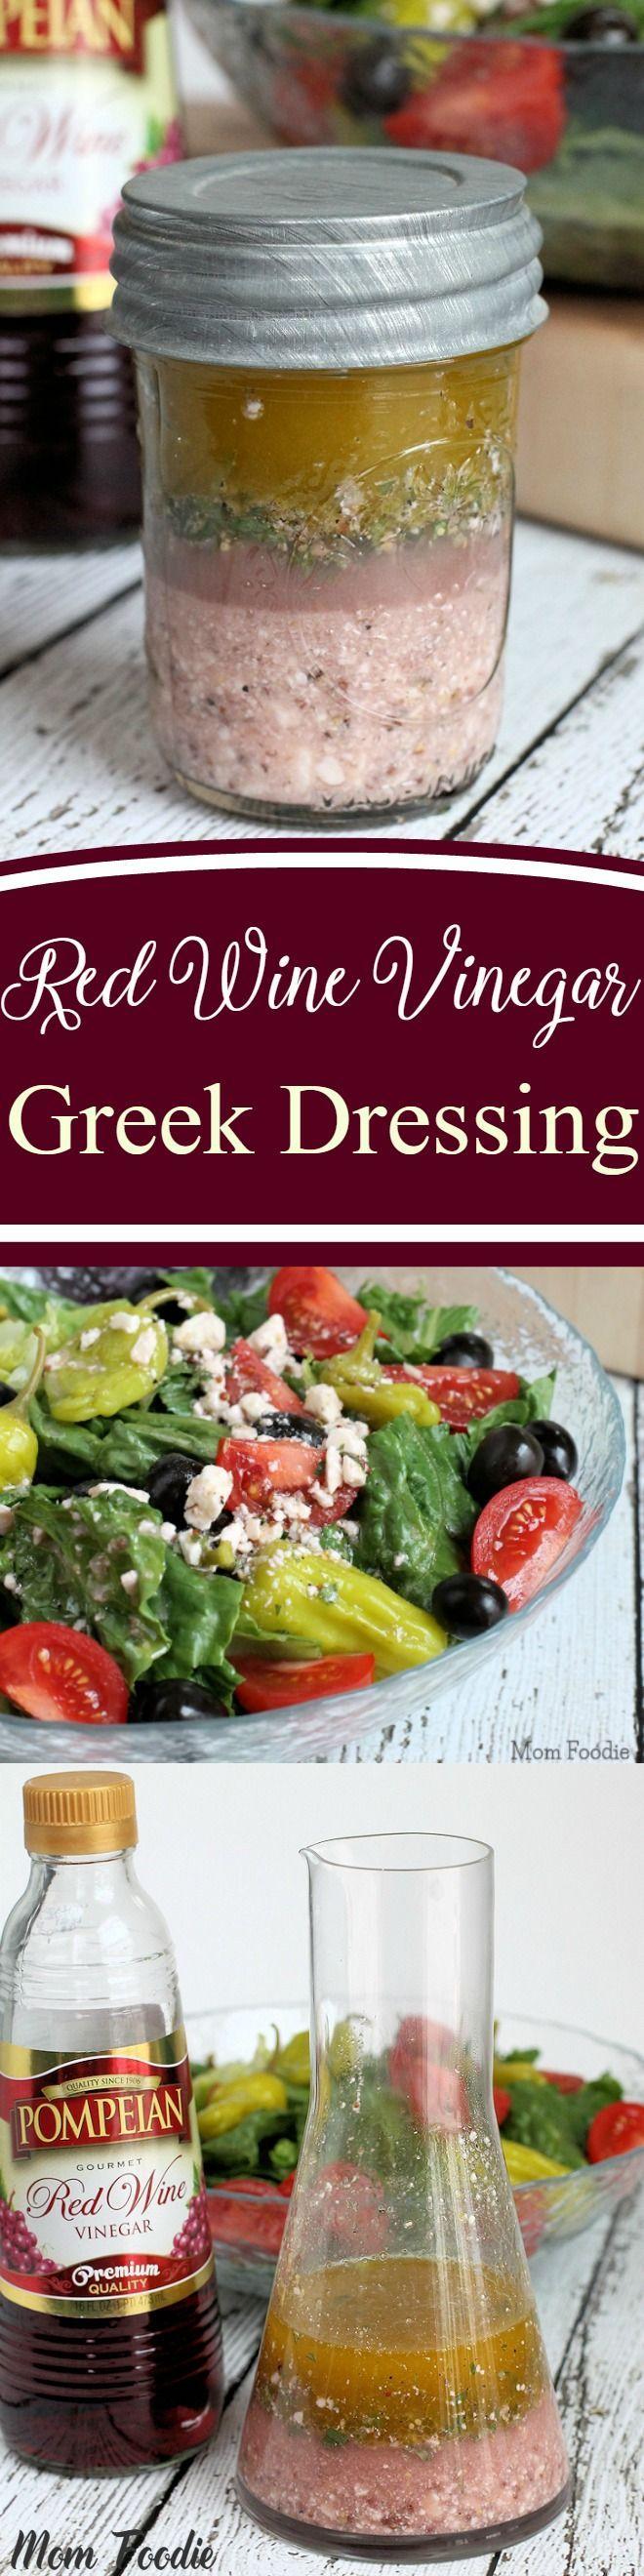 Red Wine Vinegar Greek Dressing